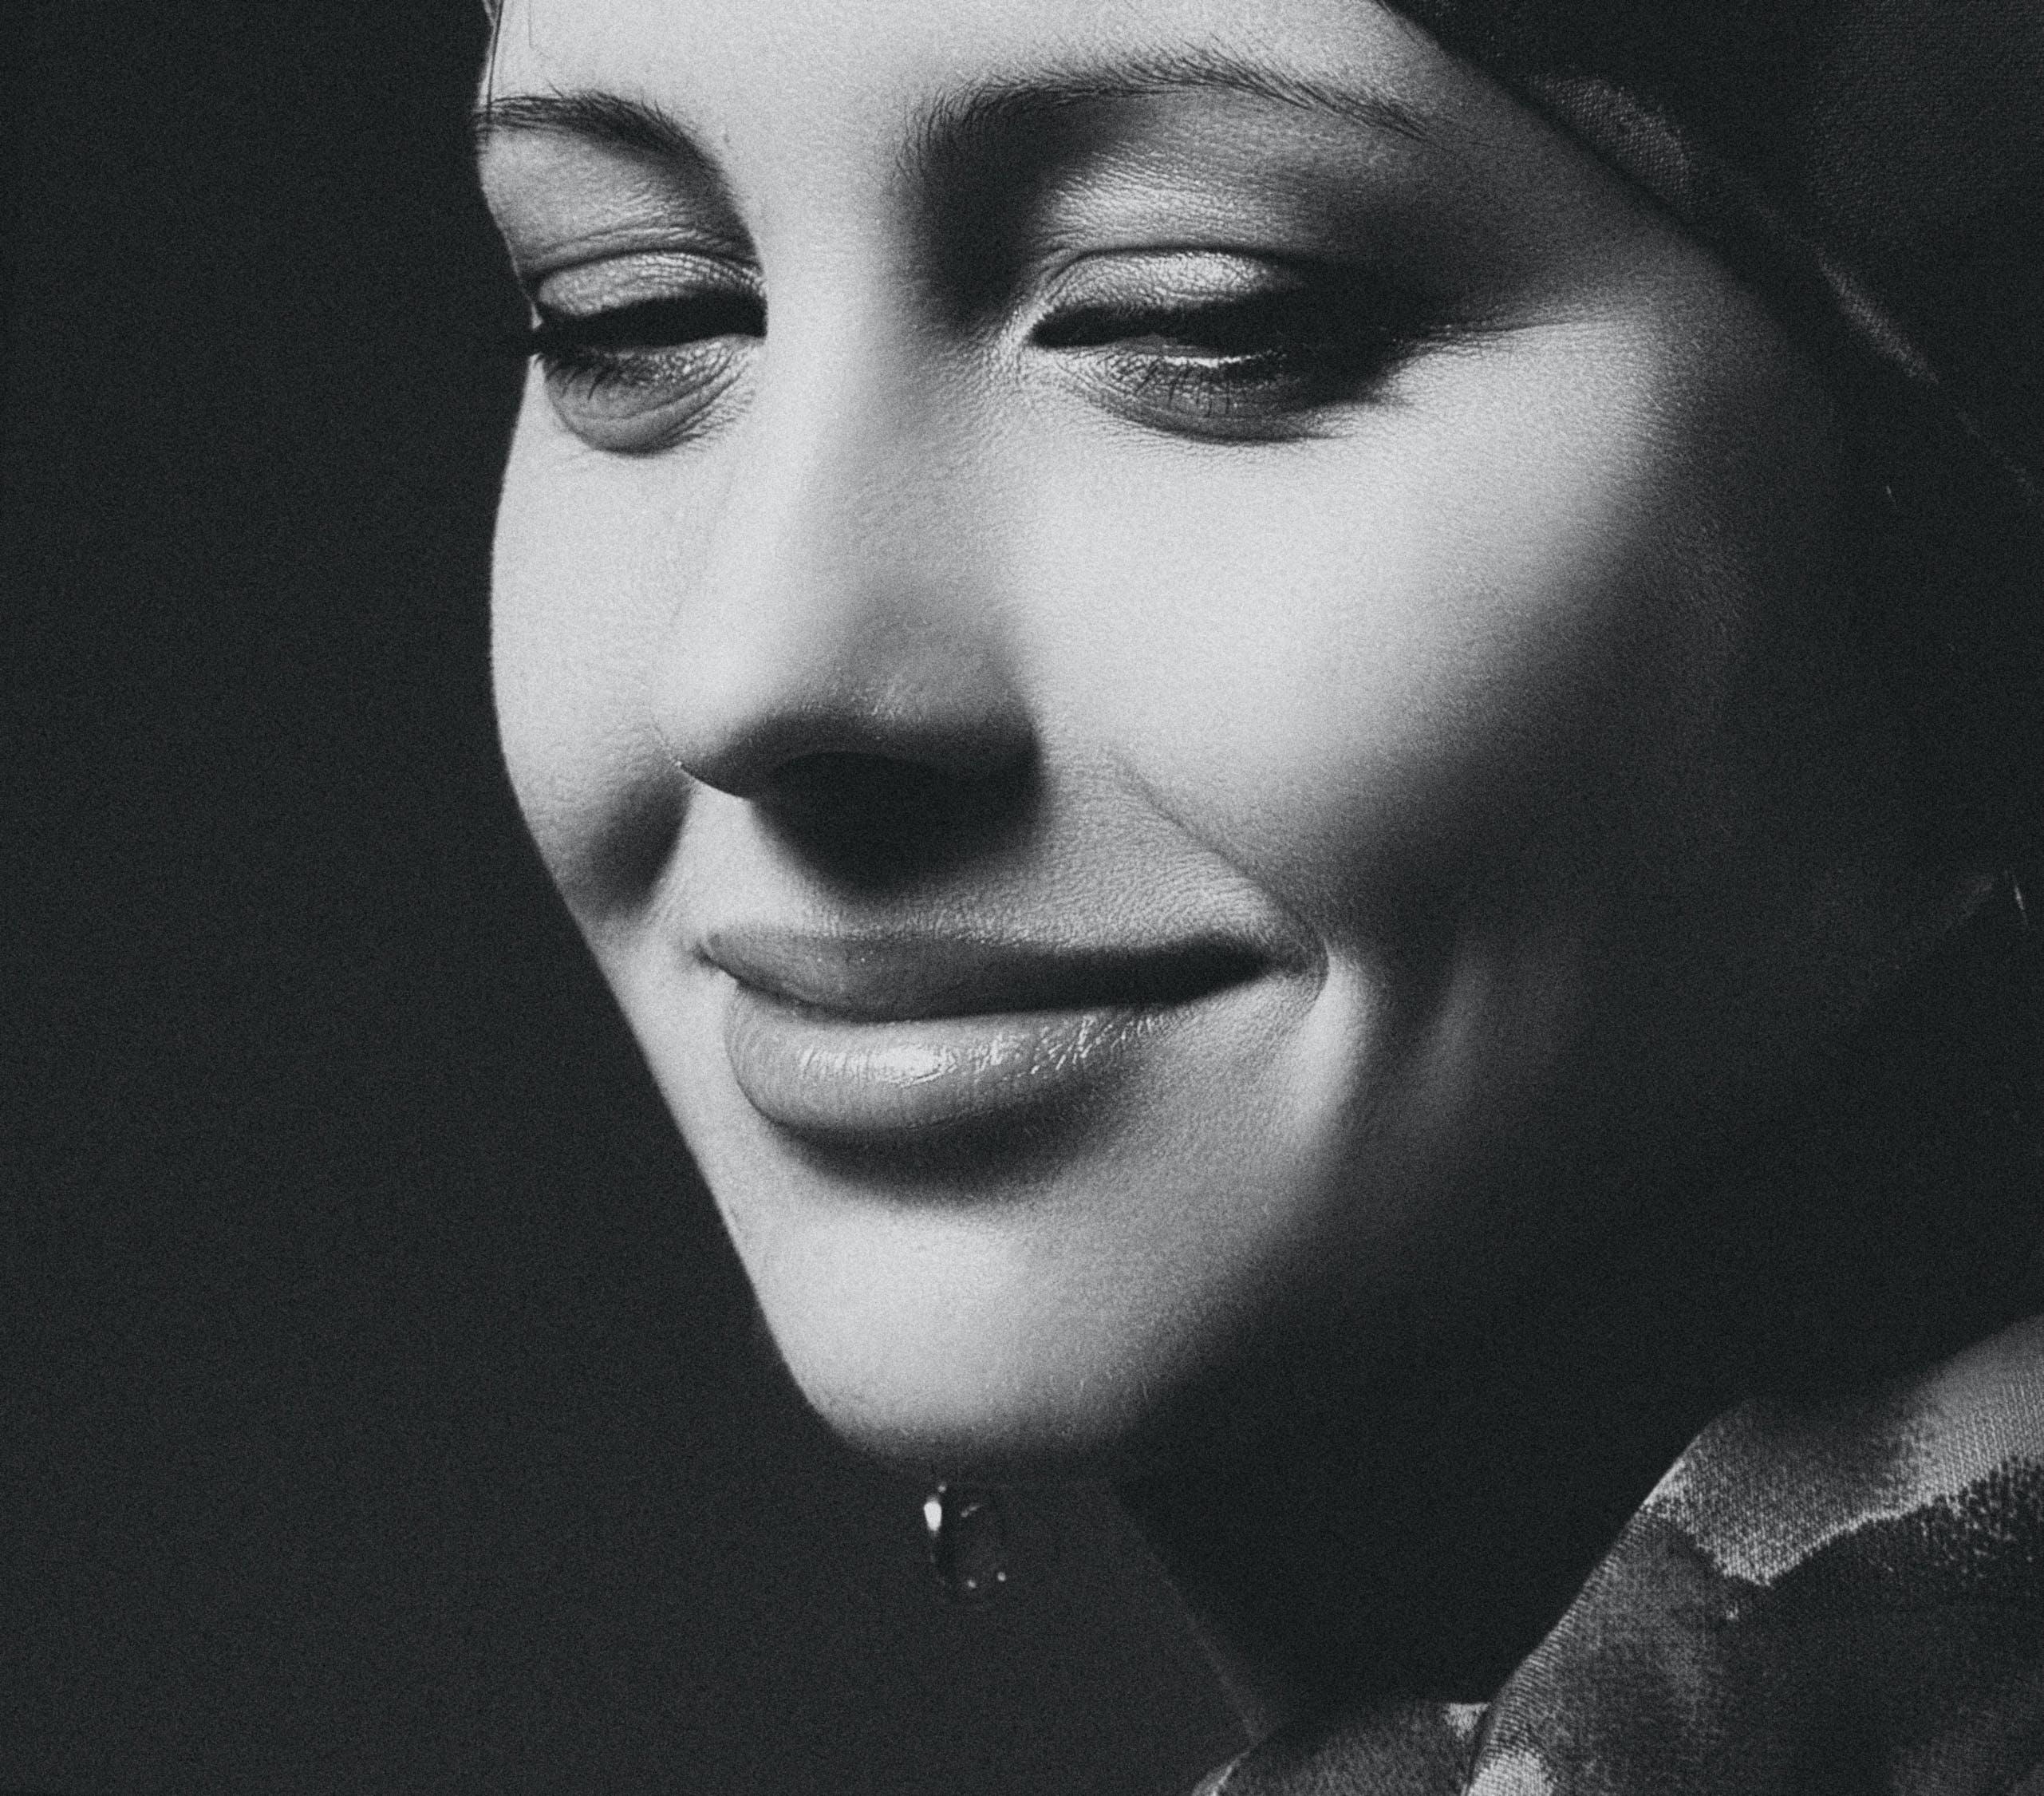 Kostenloses Stock Foto zu девушка, портрет, студия, улыбка